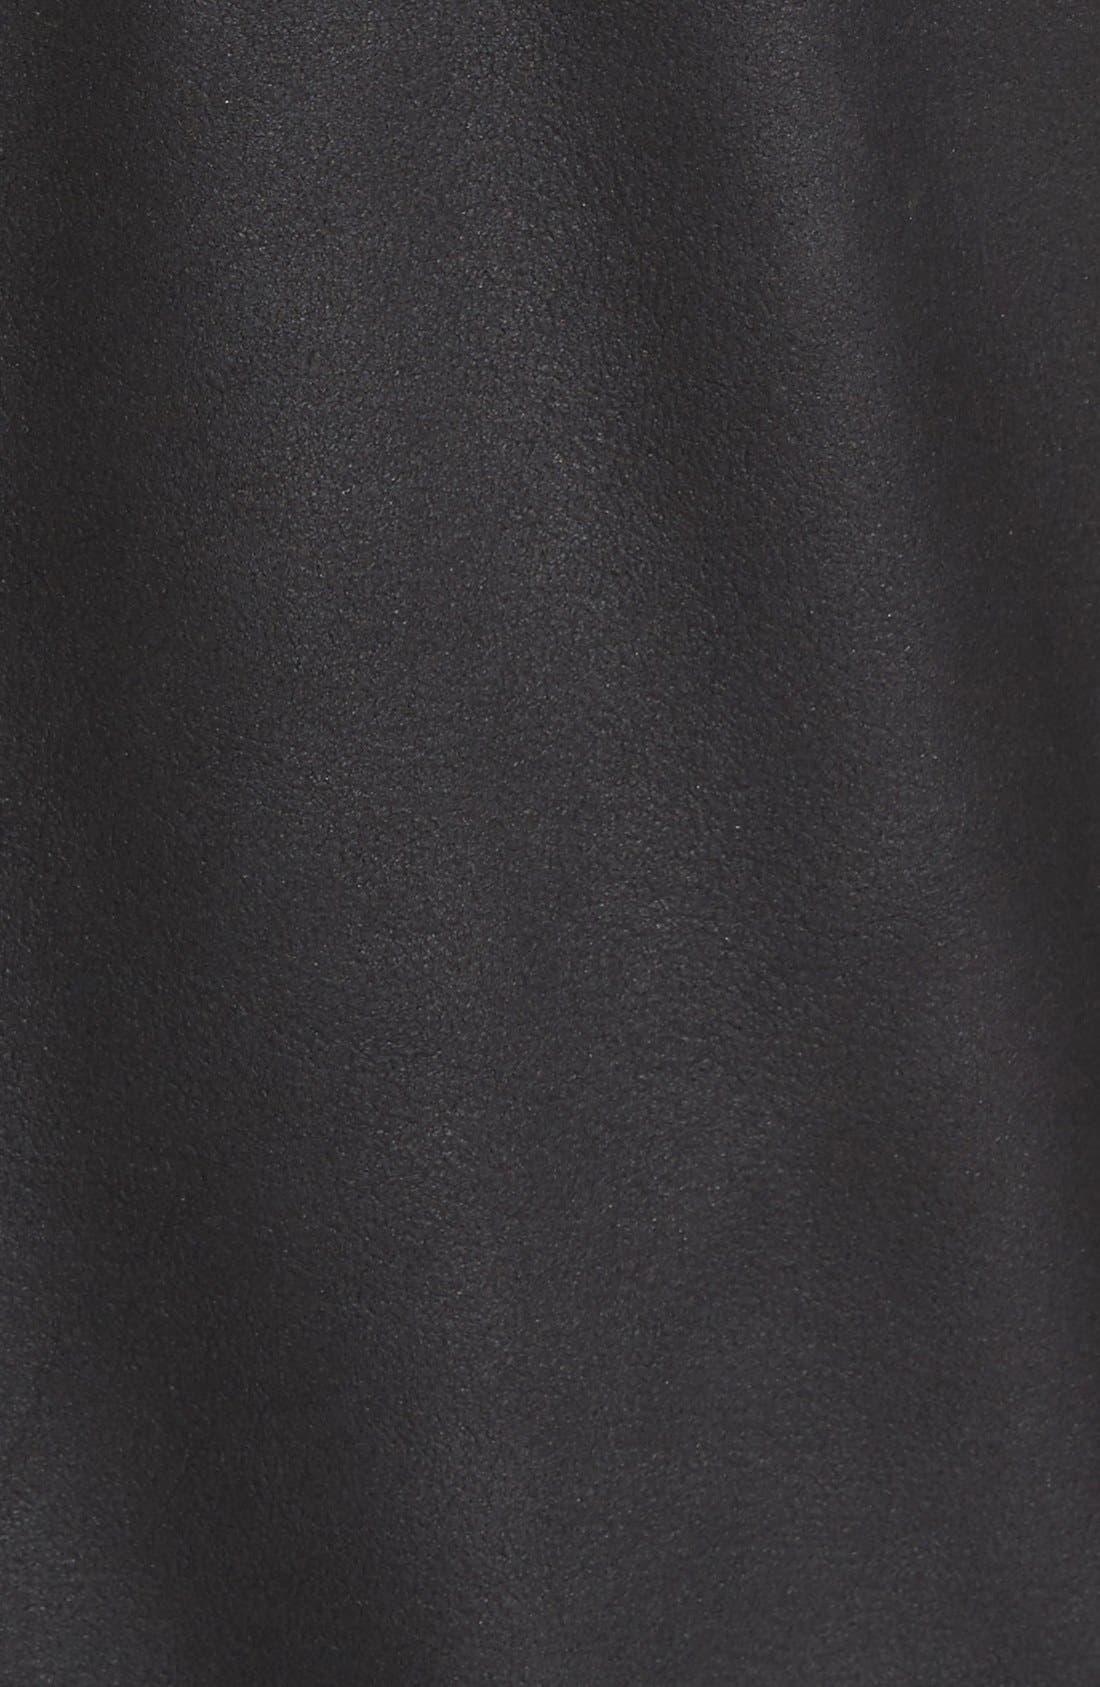 MissaniLe CollezioniLambskin Leather Jacket,                             Alternate thumbnail 5, color,                             BLACK